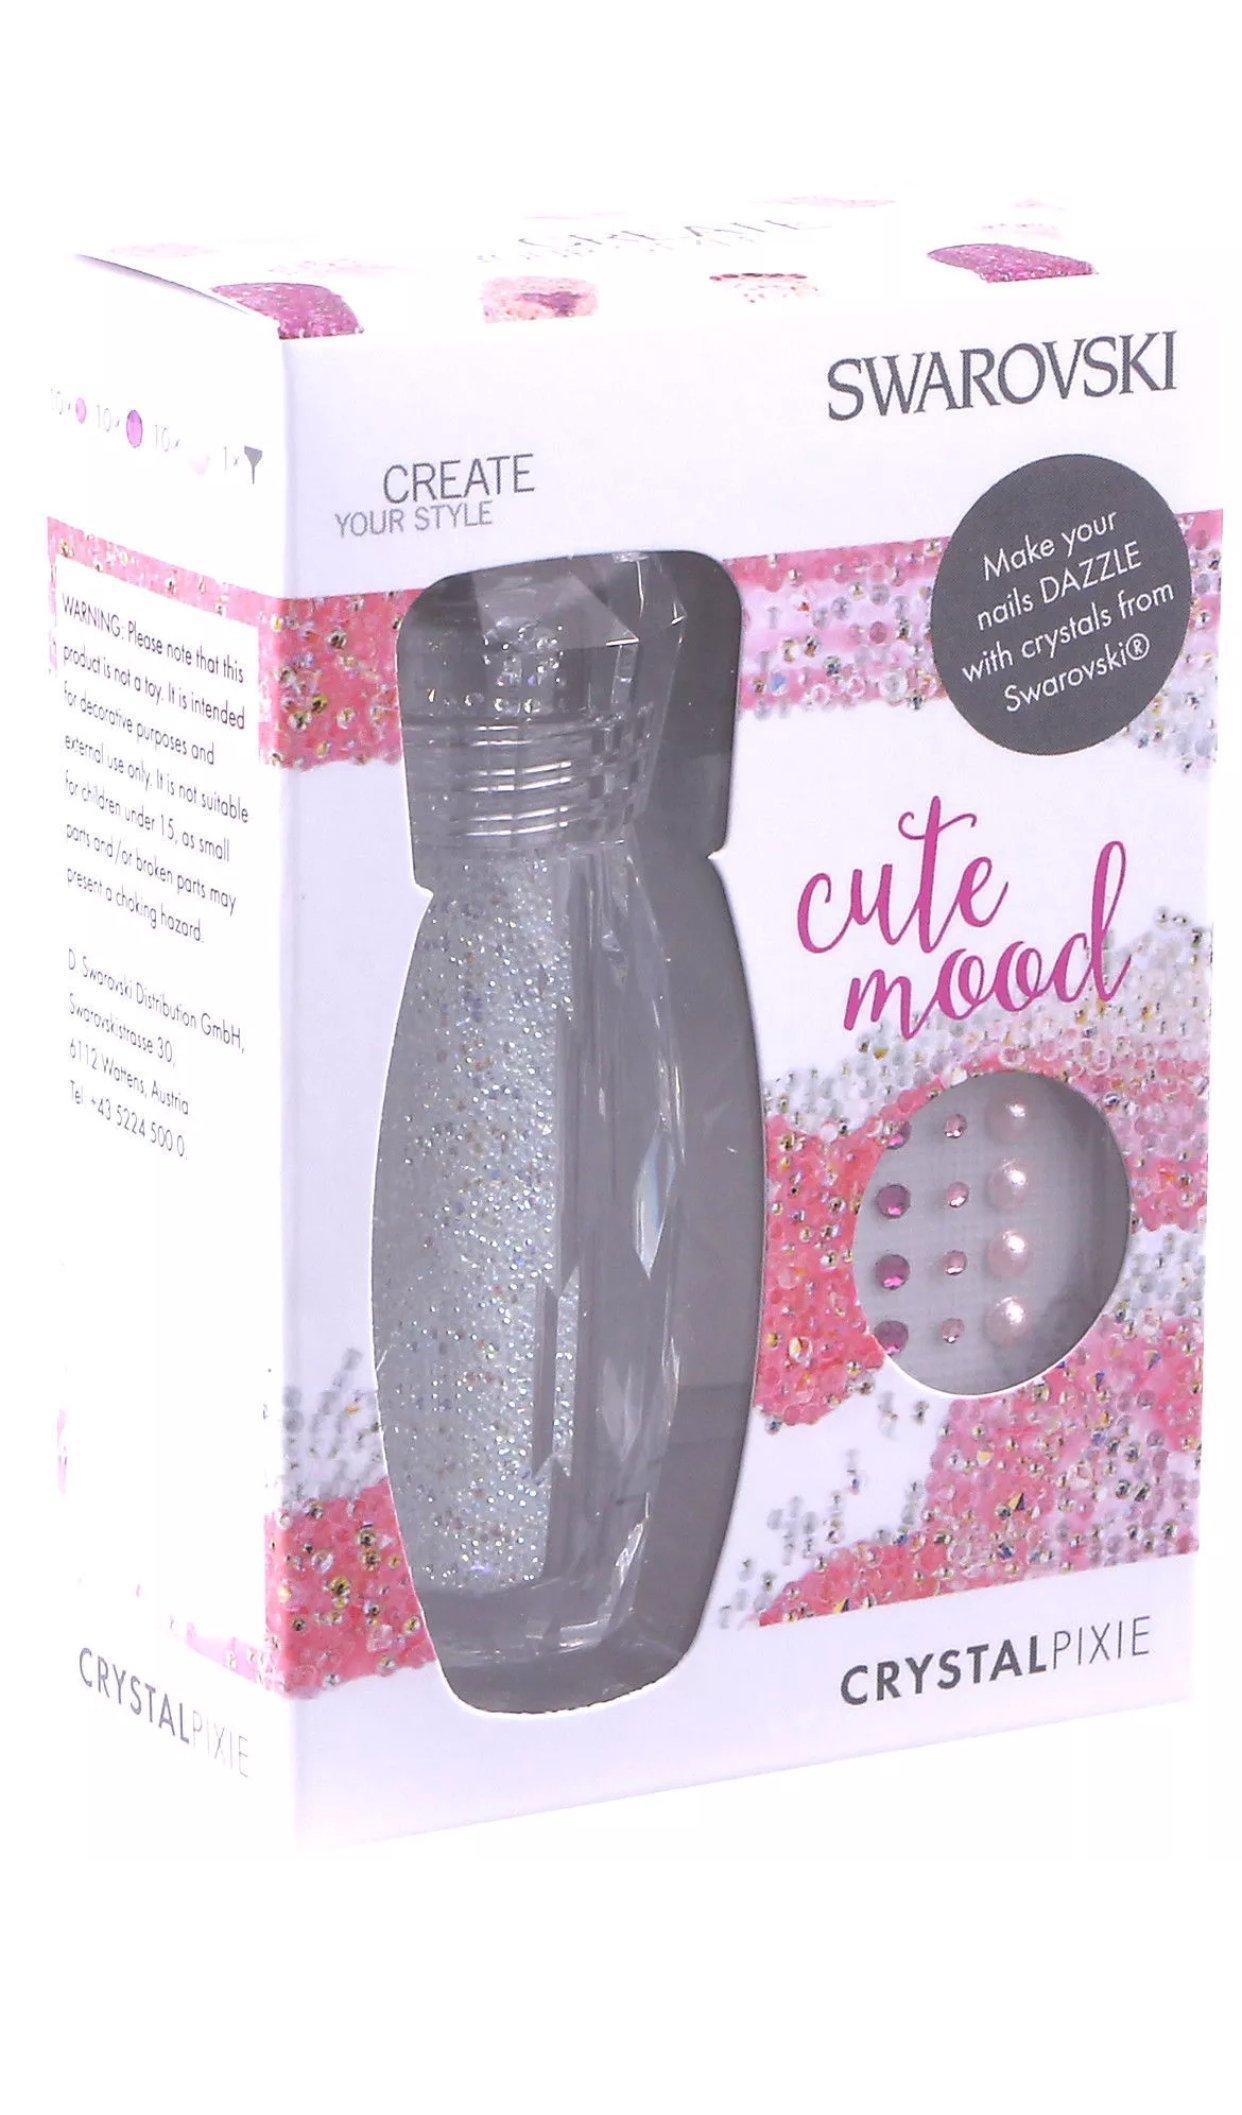 Amazon.com: PIXIE SWAROVSKI CRYSTAL CUTE MOOD (AURORA BOREAL): Beauty